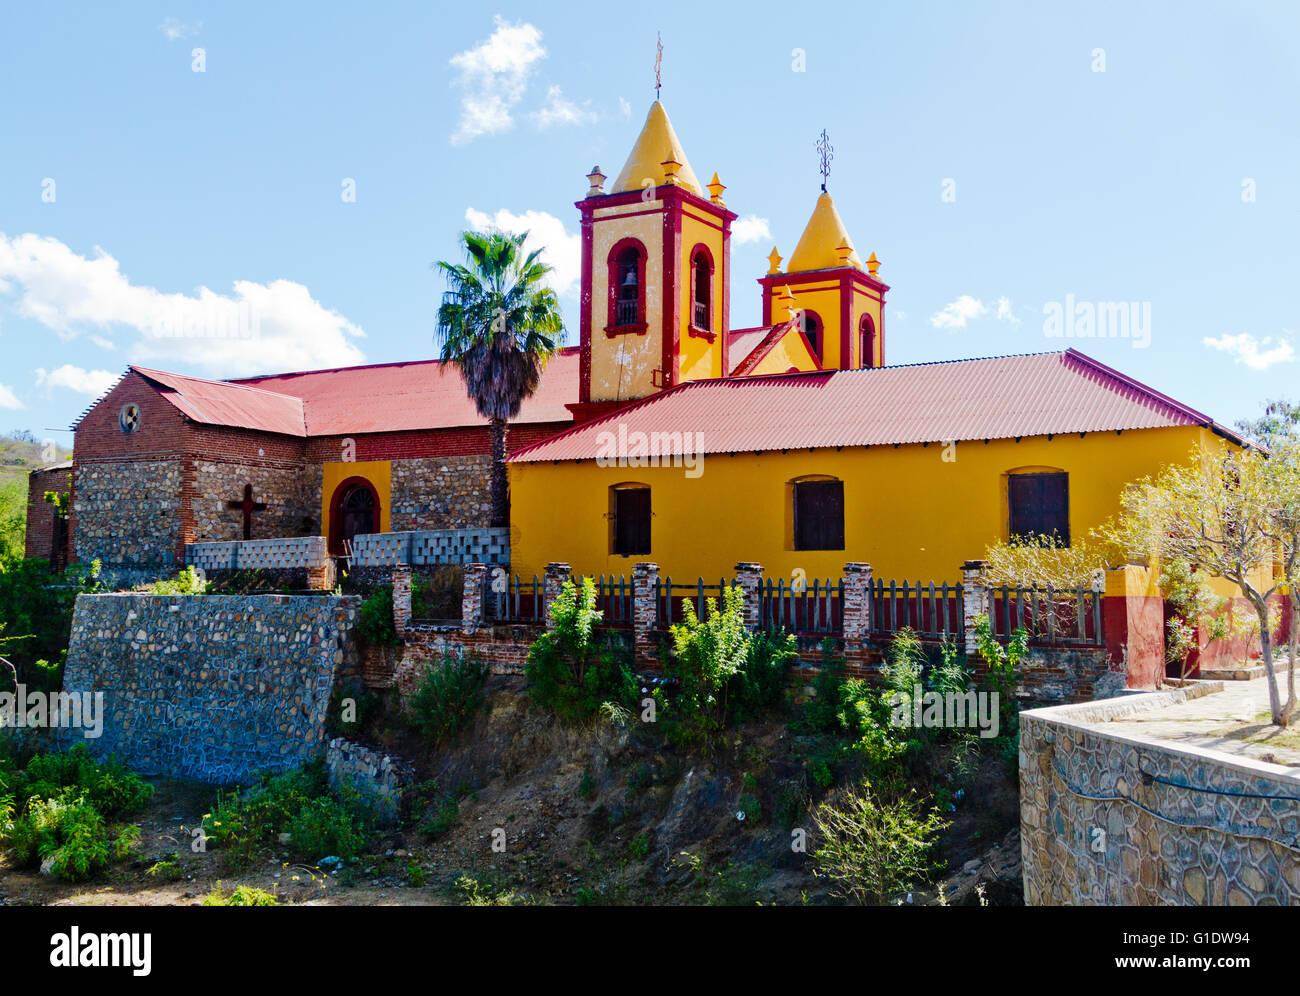 Parroquia de Nuestra Senora de Guadalupe, Parish of Our Lady of Guadalupe in El Triunfo, Baja Sur, Mexico Stock Photo